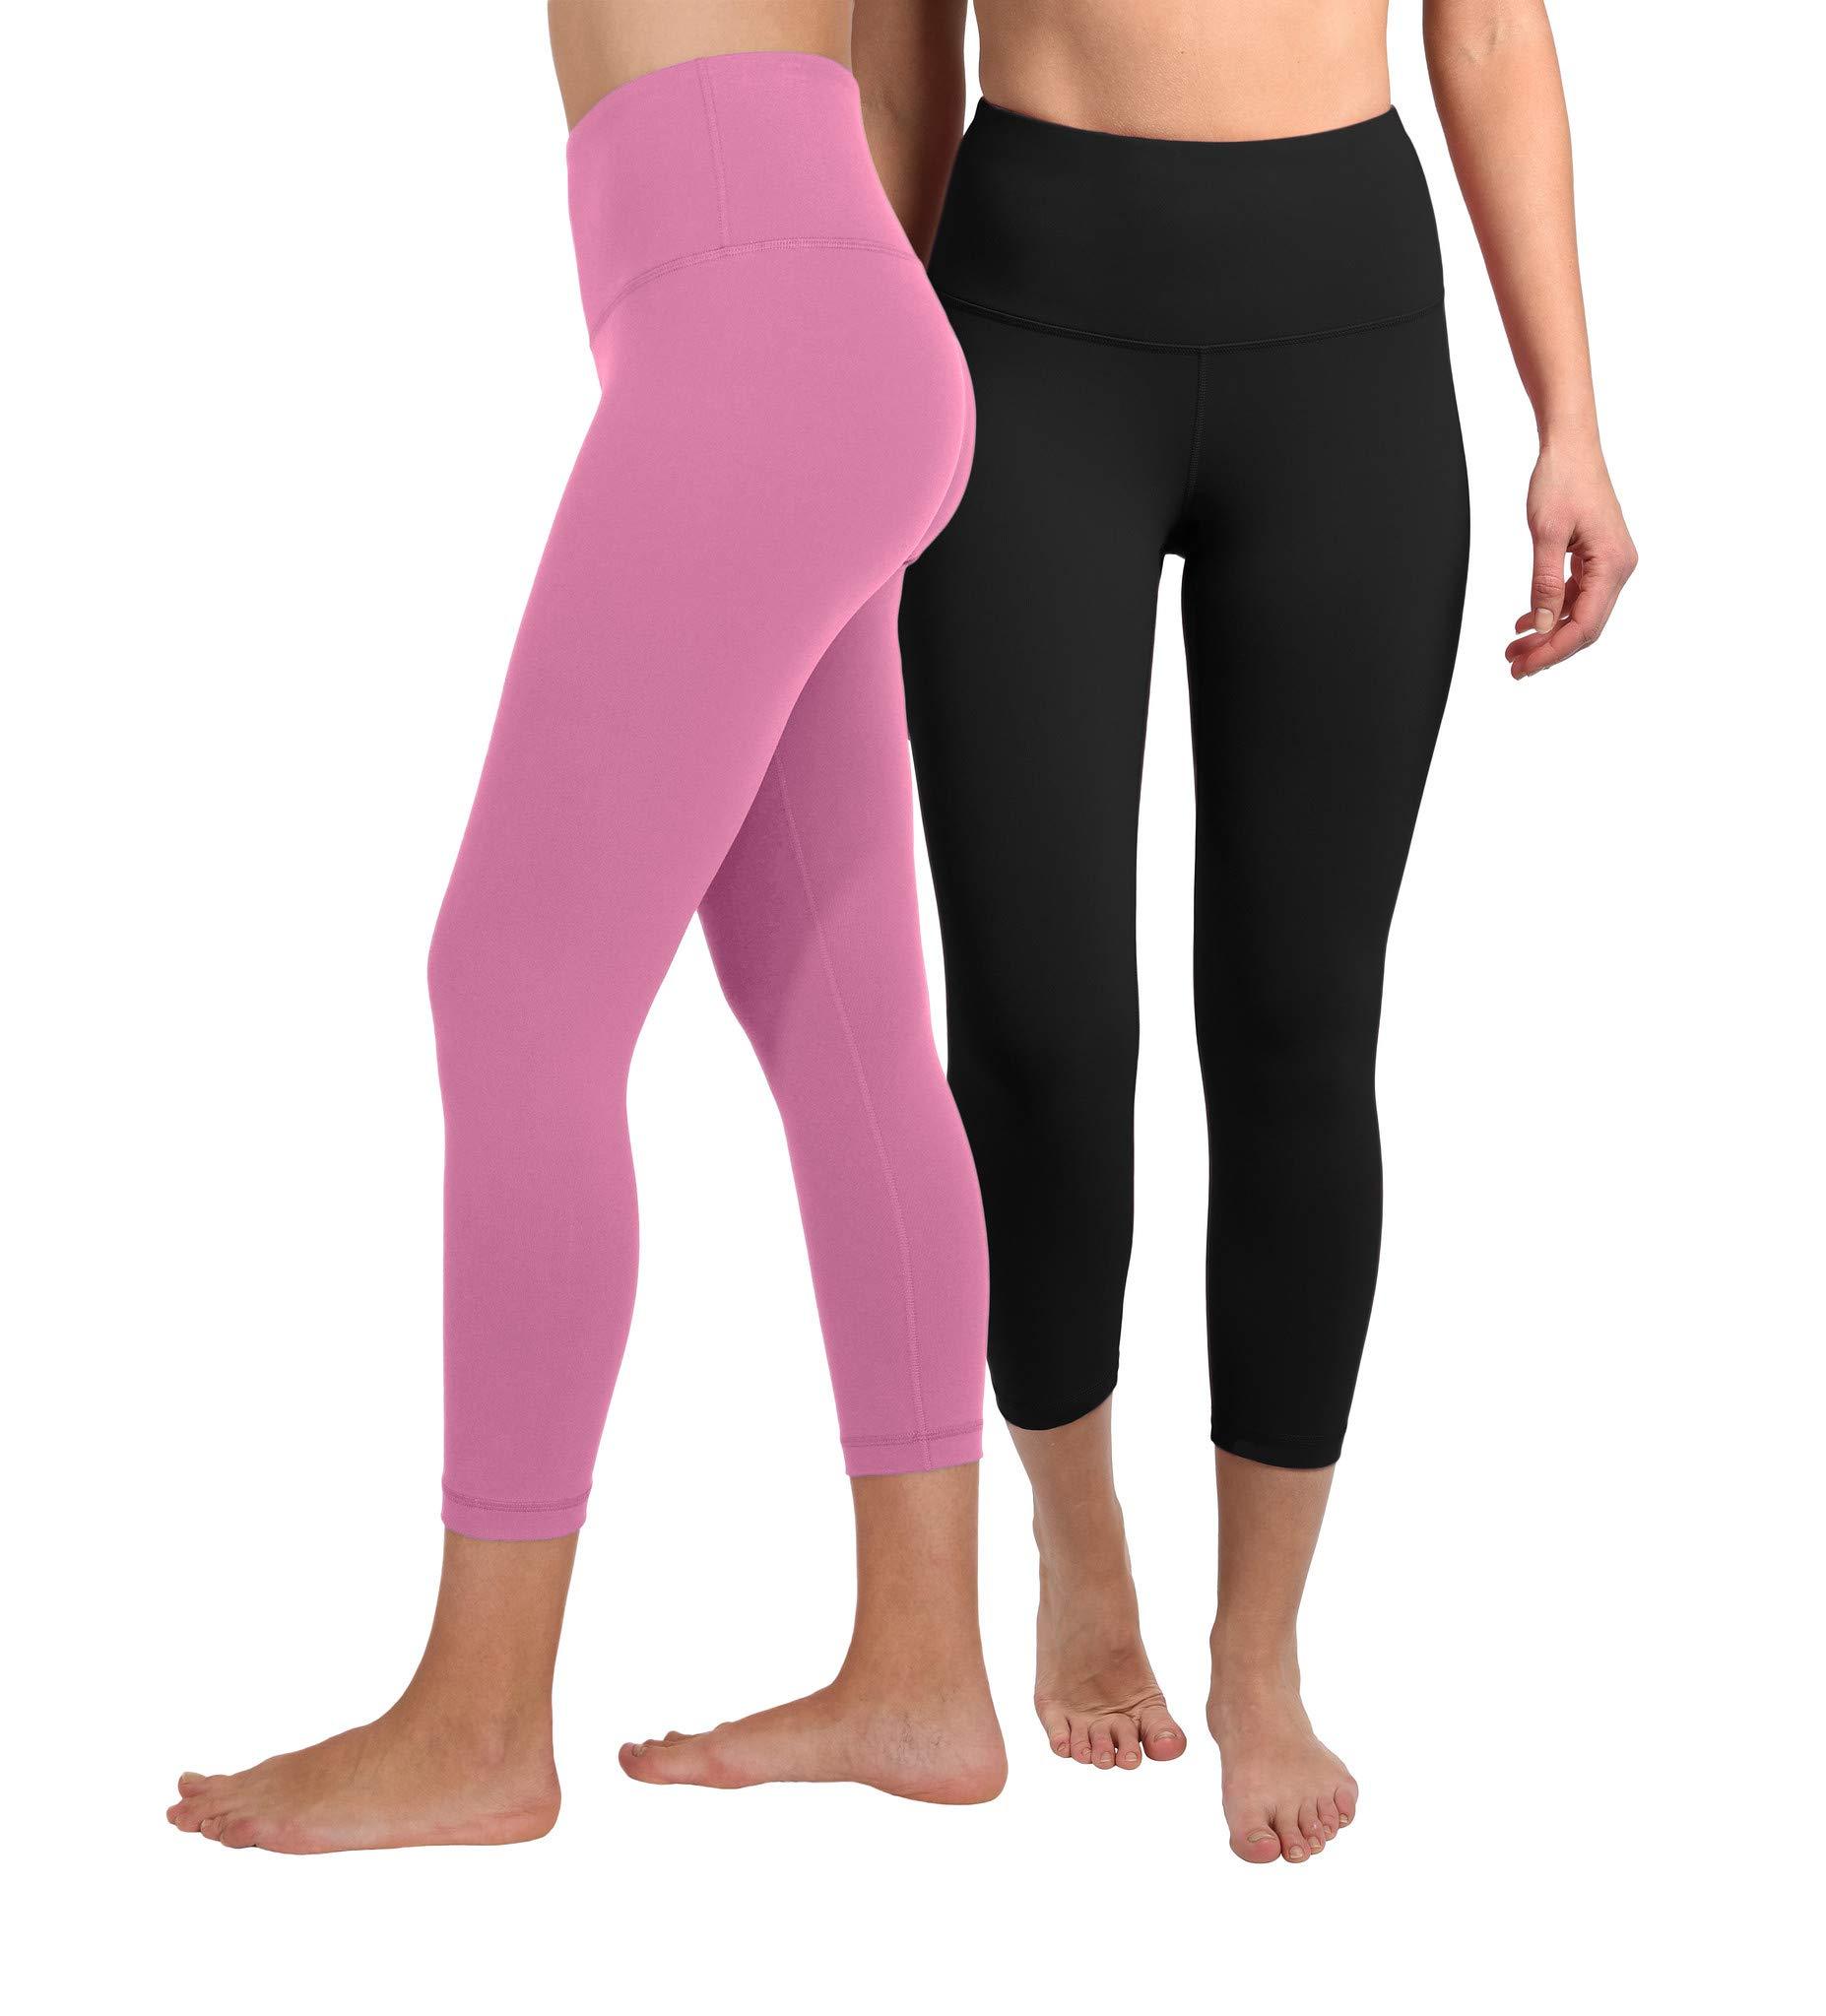 90 Degree By Reflex - High Waist Tummy Control Shapewear - Power Flex Capri - Black and Cuban Orchid 2 Pack - XS